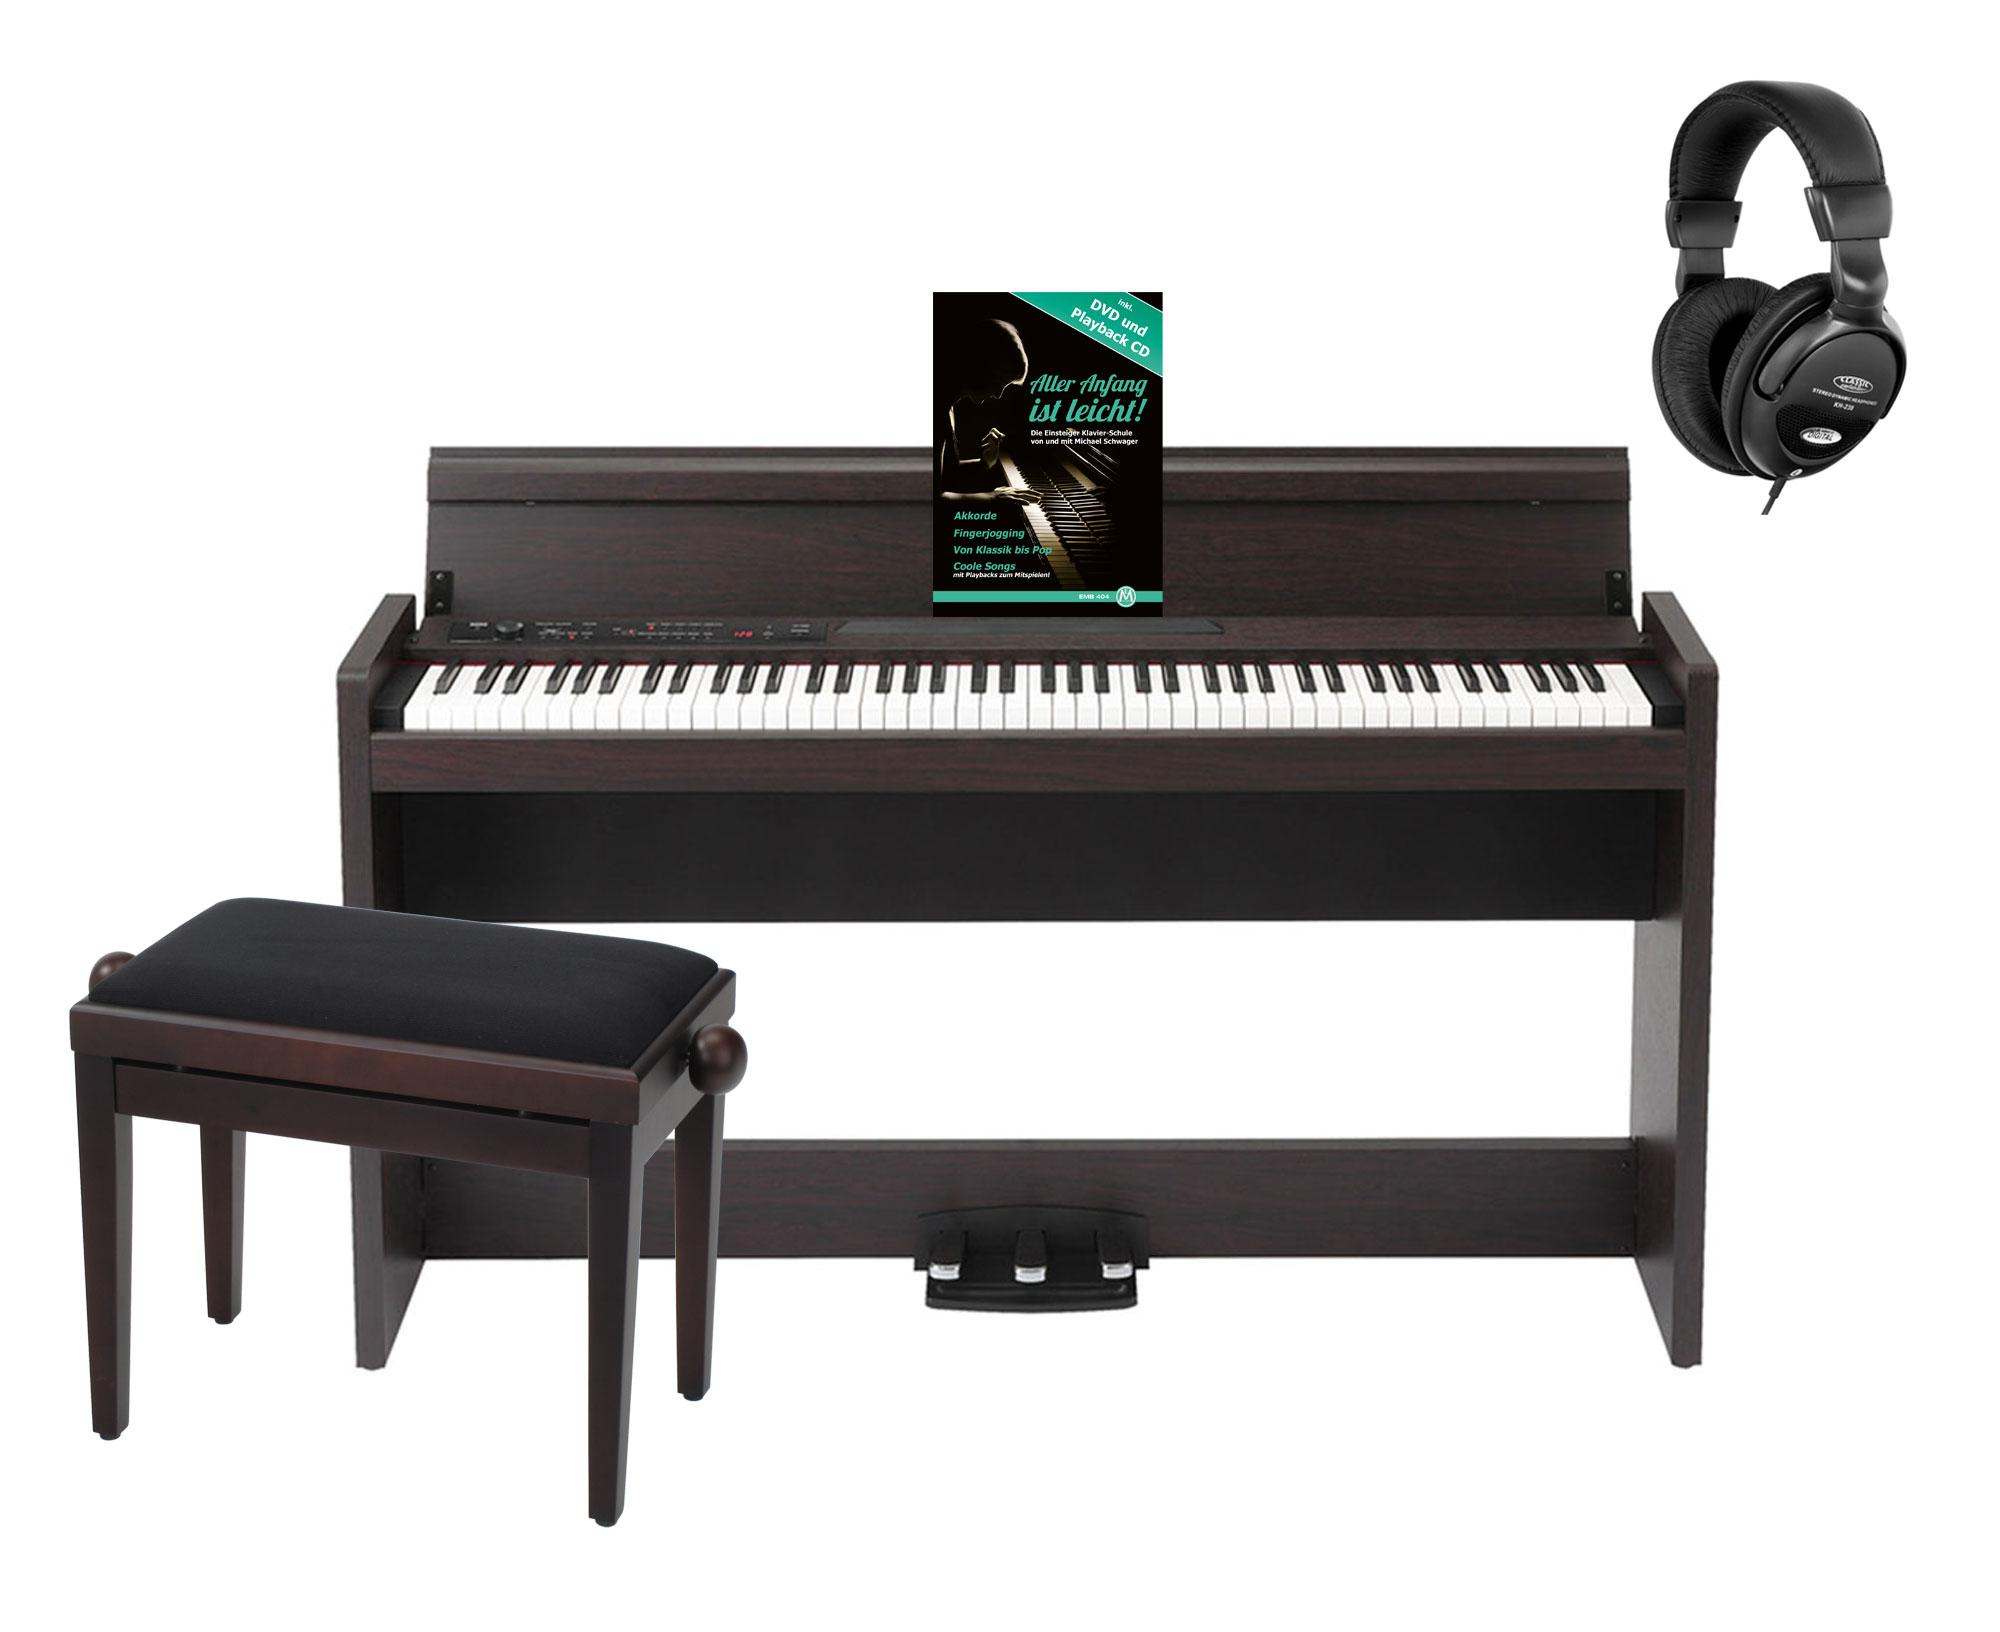 Korg LP 380 RW Digitalpiano Rosenholz SET mit Bank, Kopfhörer und Noten